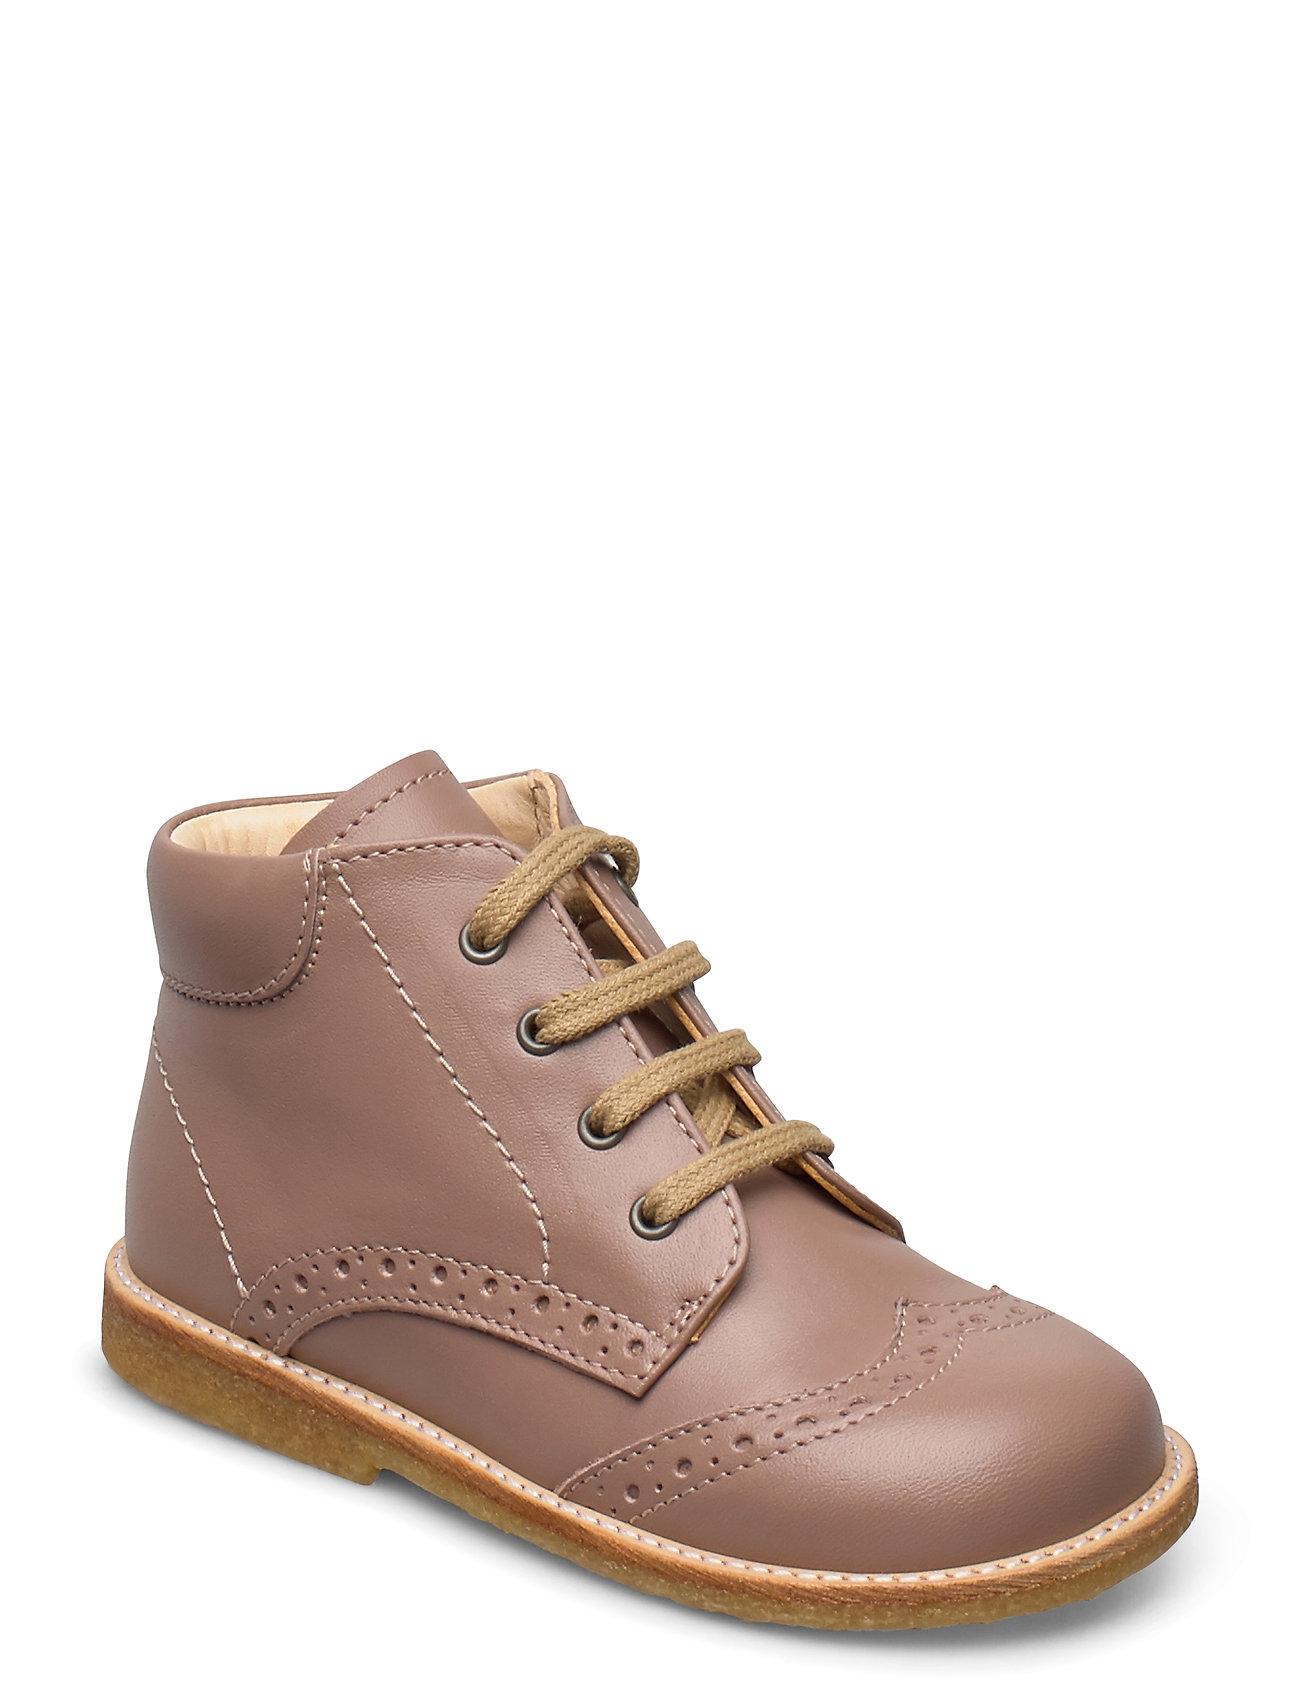 Image of Baby Shoe Shoes Pre Walkers Beginner Shoes 18-25 Beige ANGULUS (3428855105)